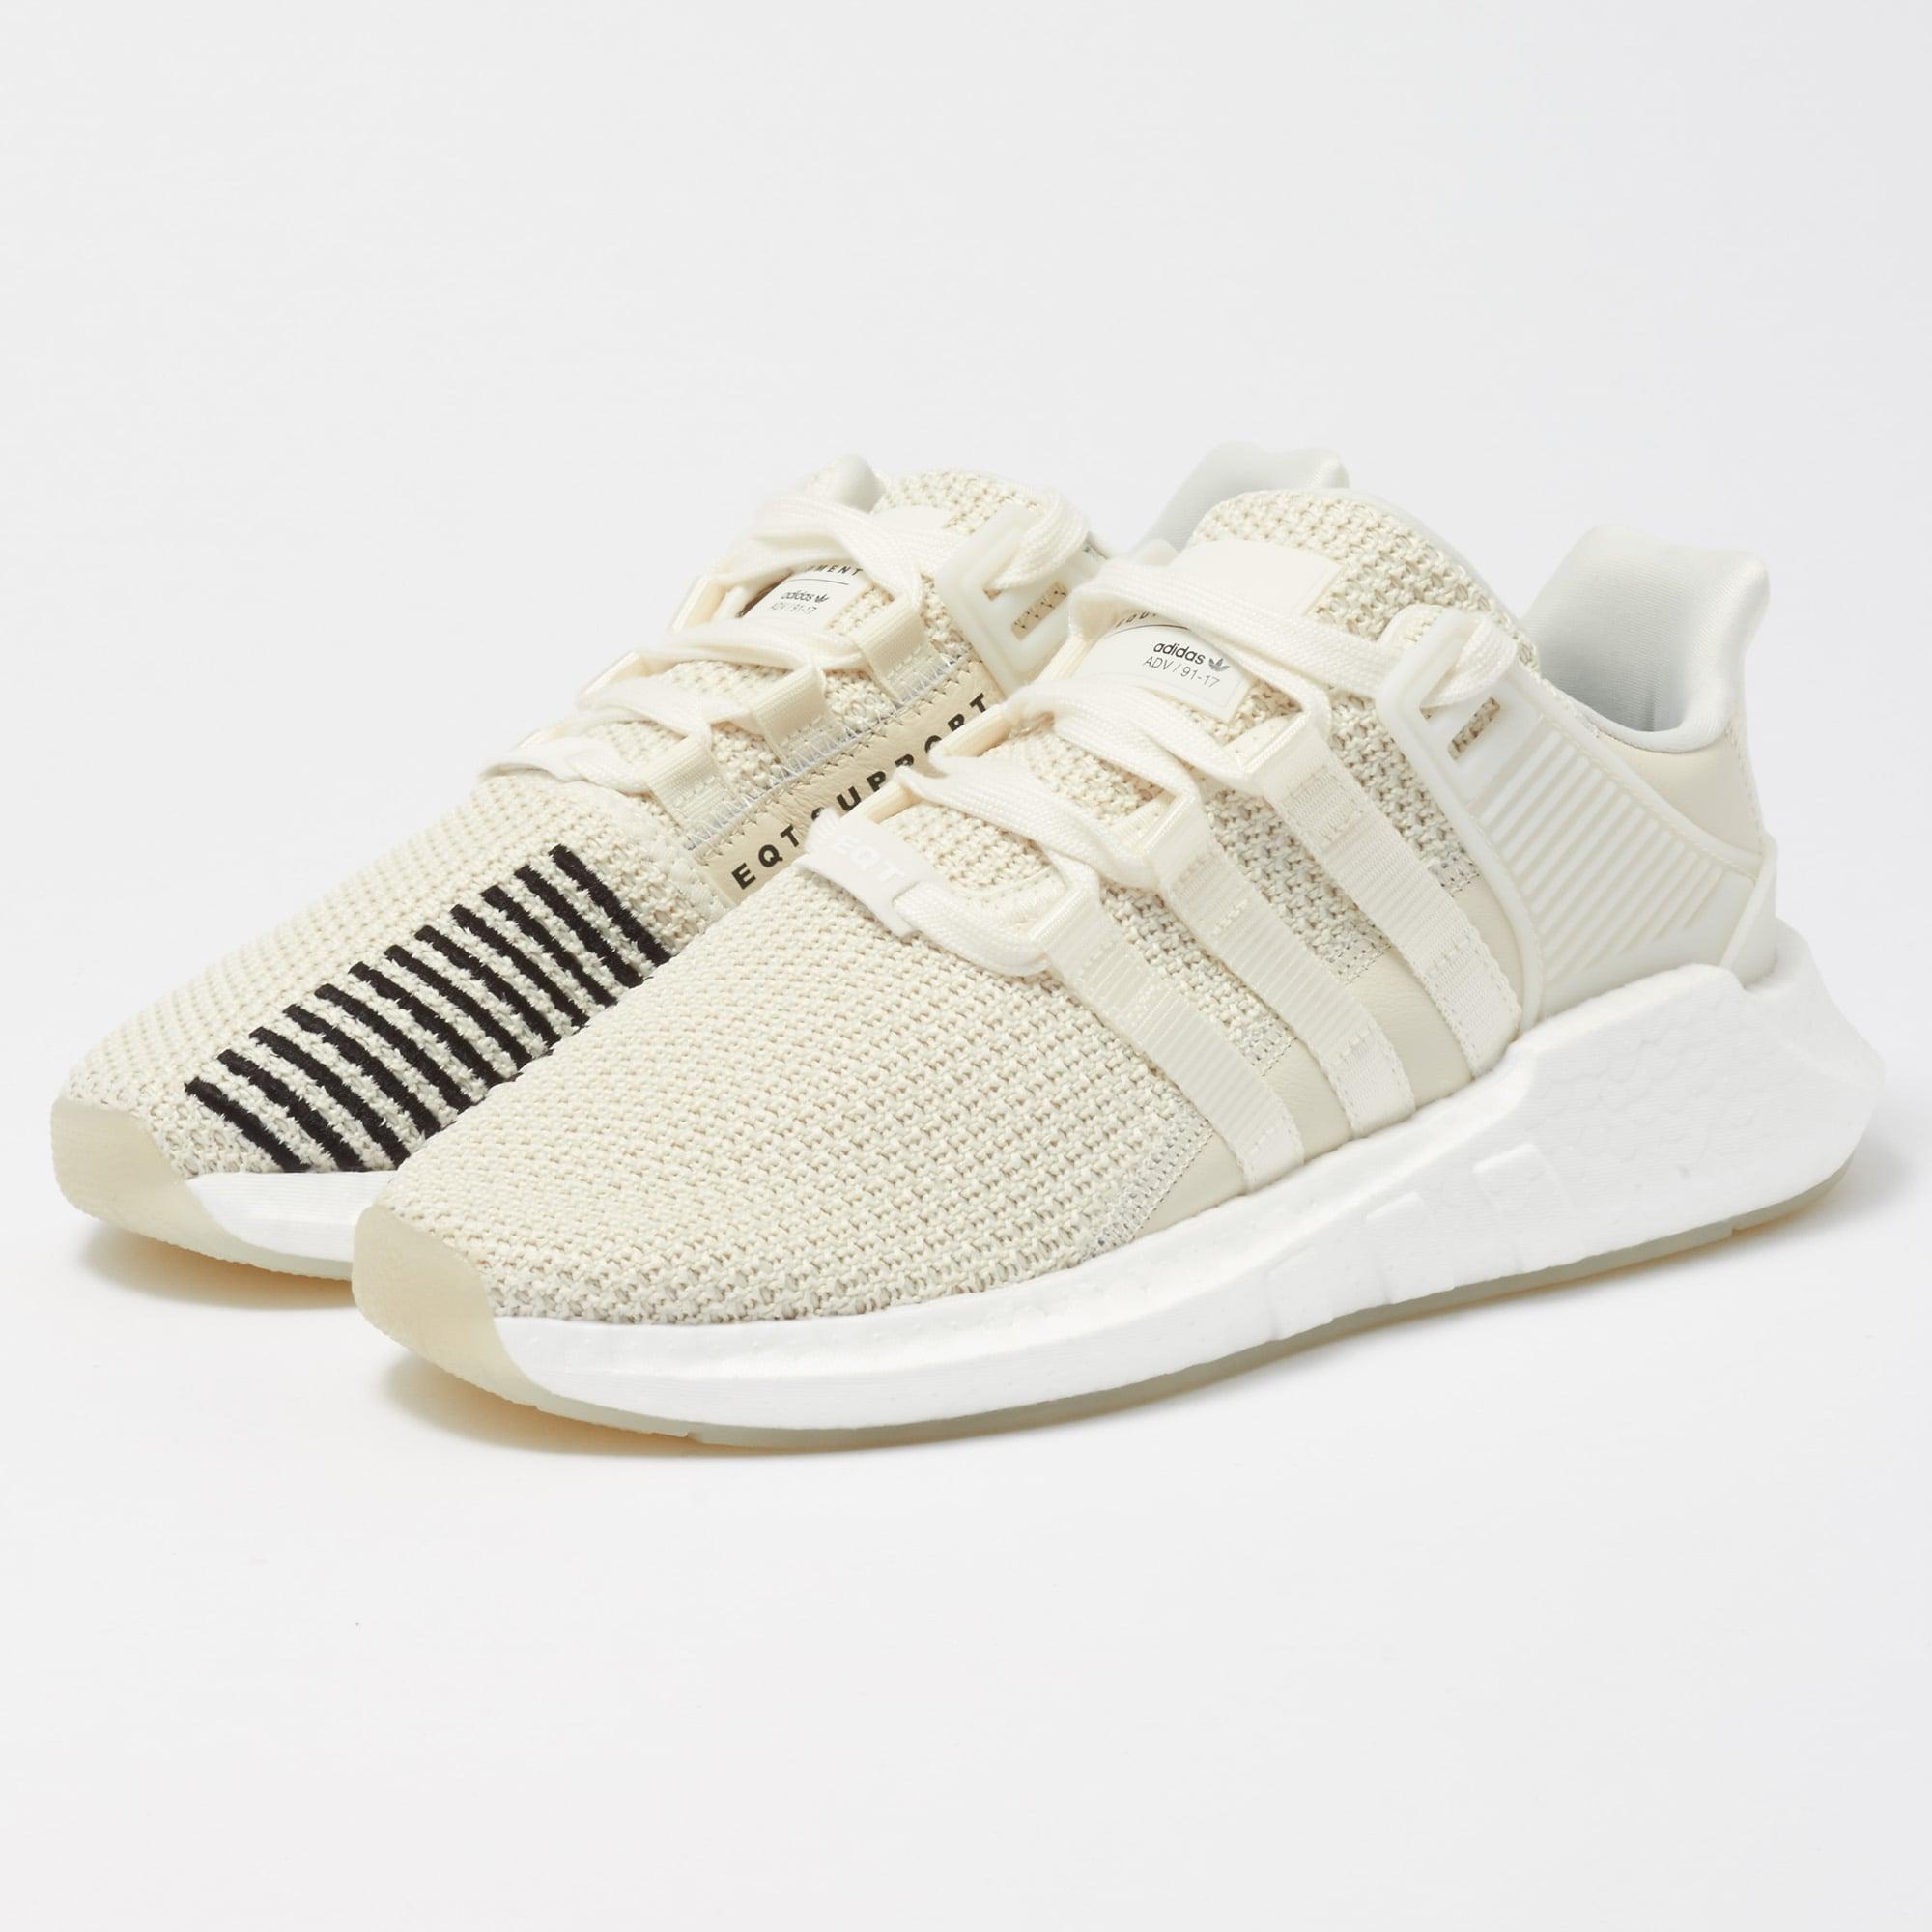 promo code 1cbb0 7c6ce ... new concept 8b554 a5859 Lyst - Adidas Originals Eqt Support 93 17 - Off  White in ...